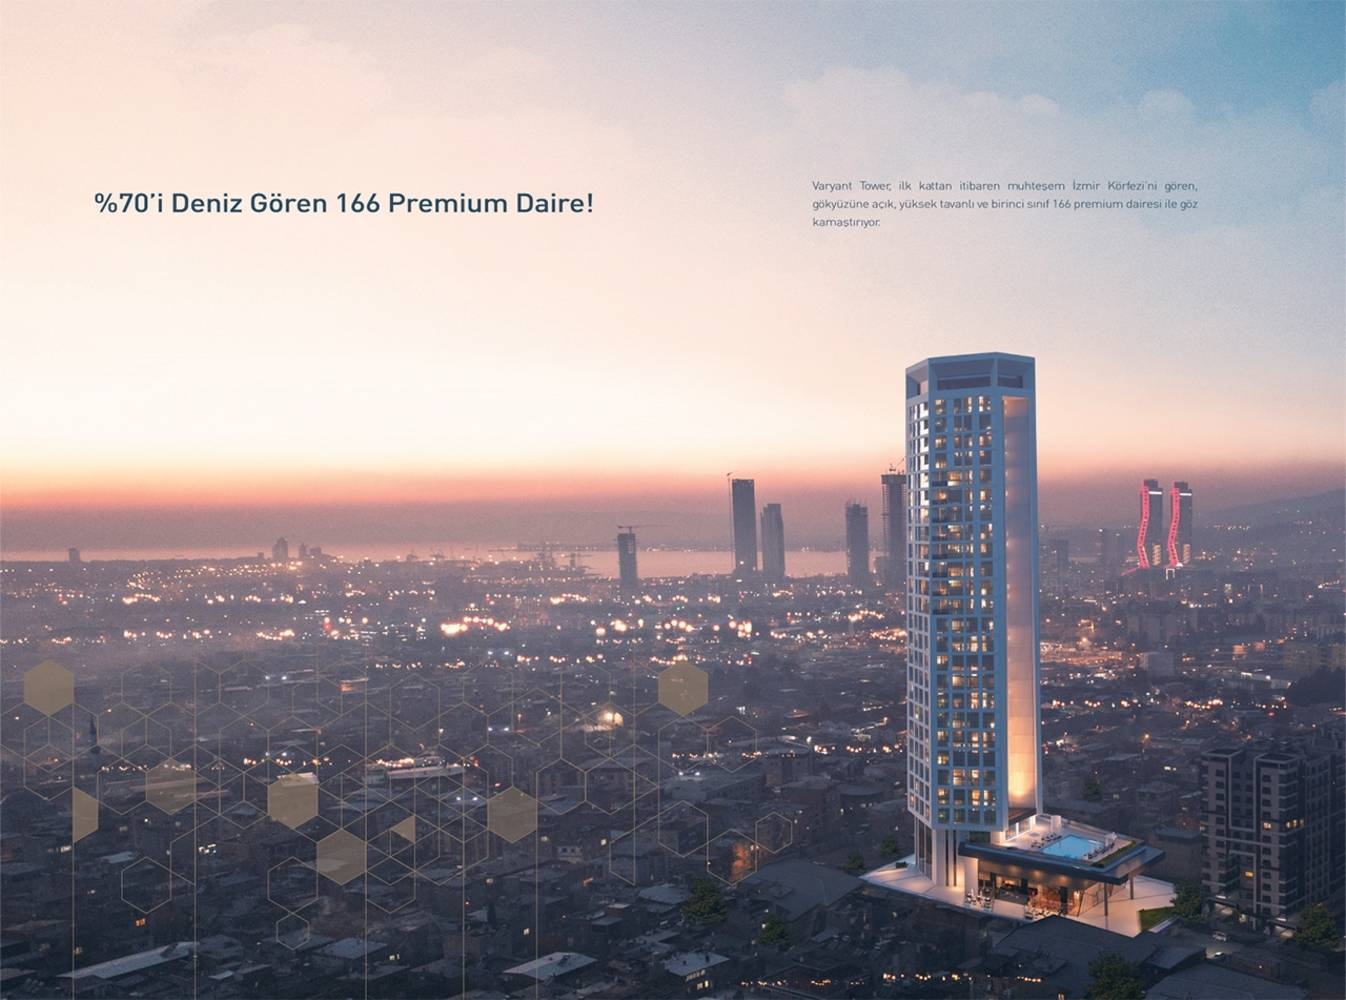 Varyant Tower